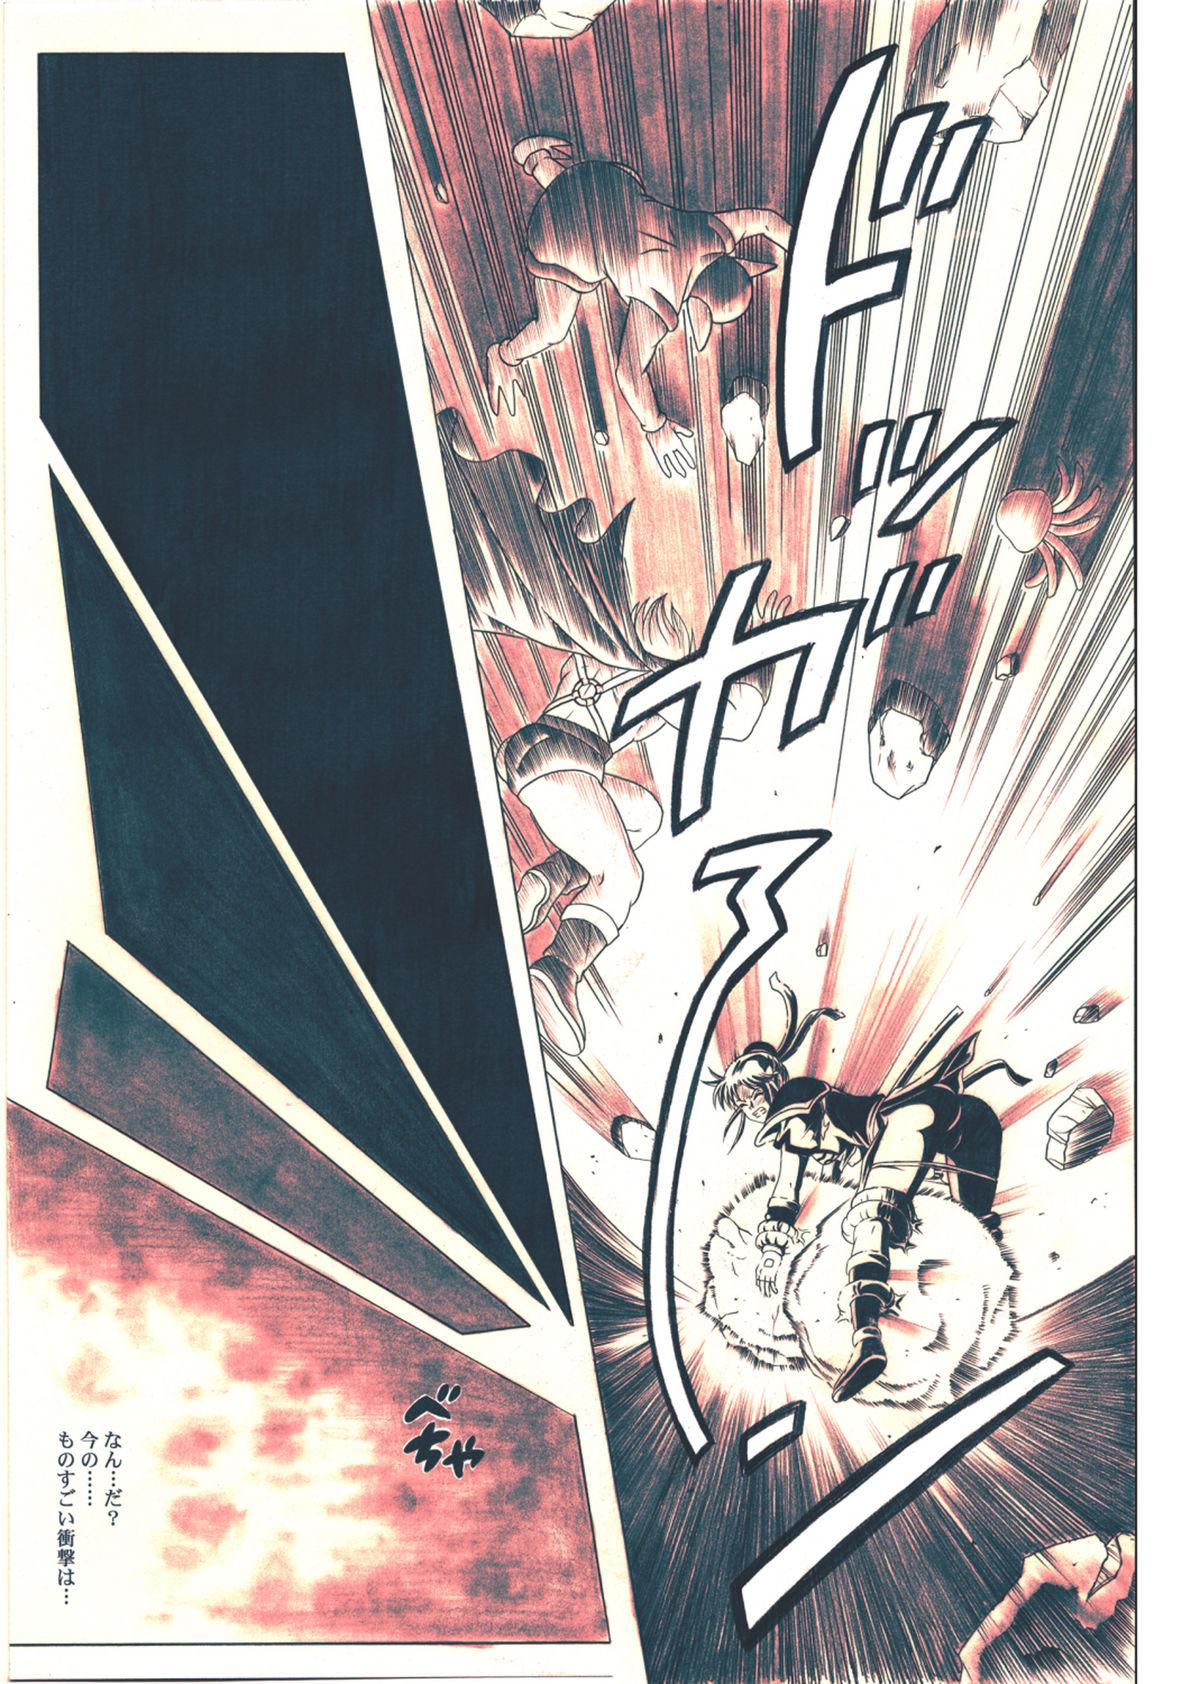 [Cyclone (Reizei, Izumi)] STAR TAC IDO ~Youkuso Haja no Doukutsu he~ Chuuhen Download edition (Dragon Warrior: Dai's Great Adventure) [Digital] 88